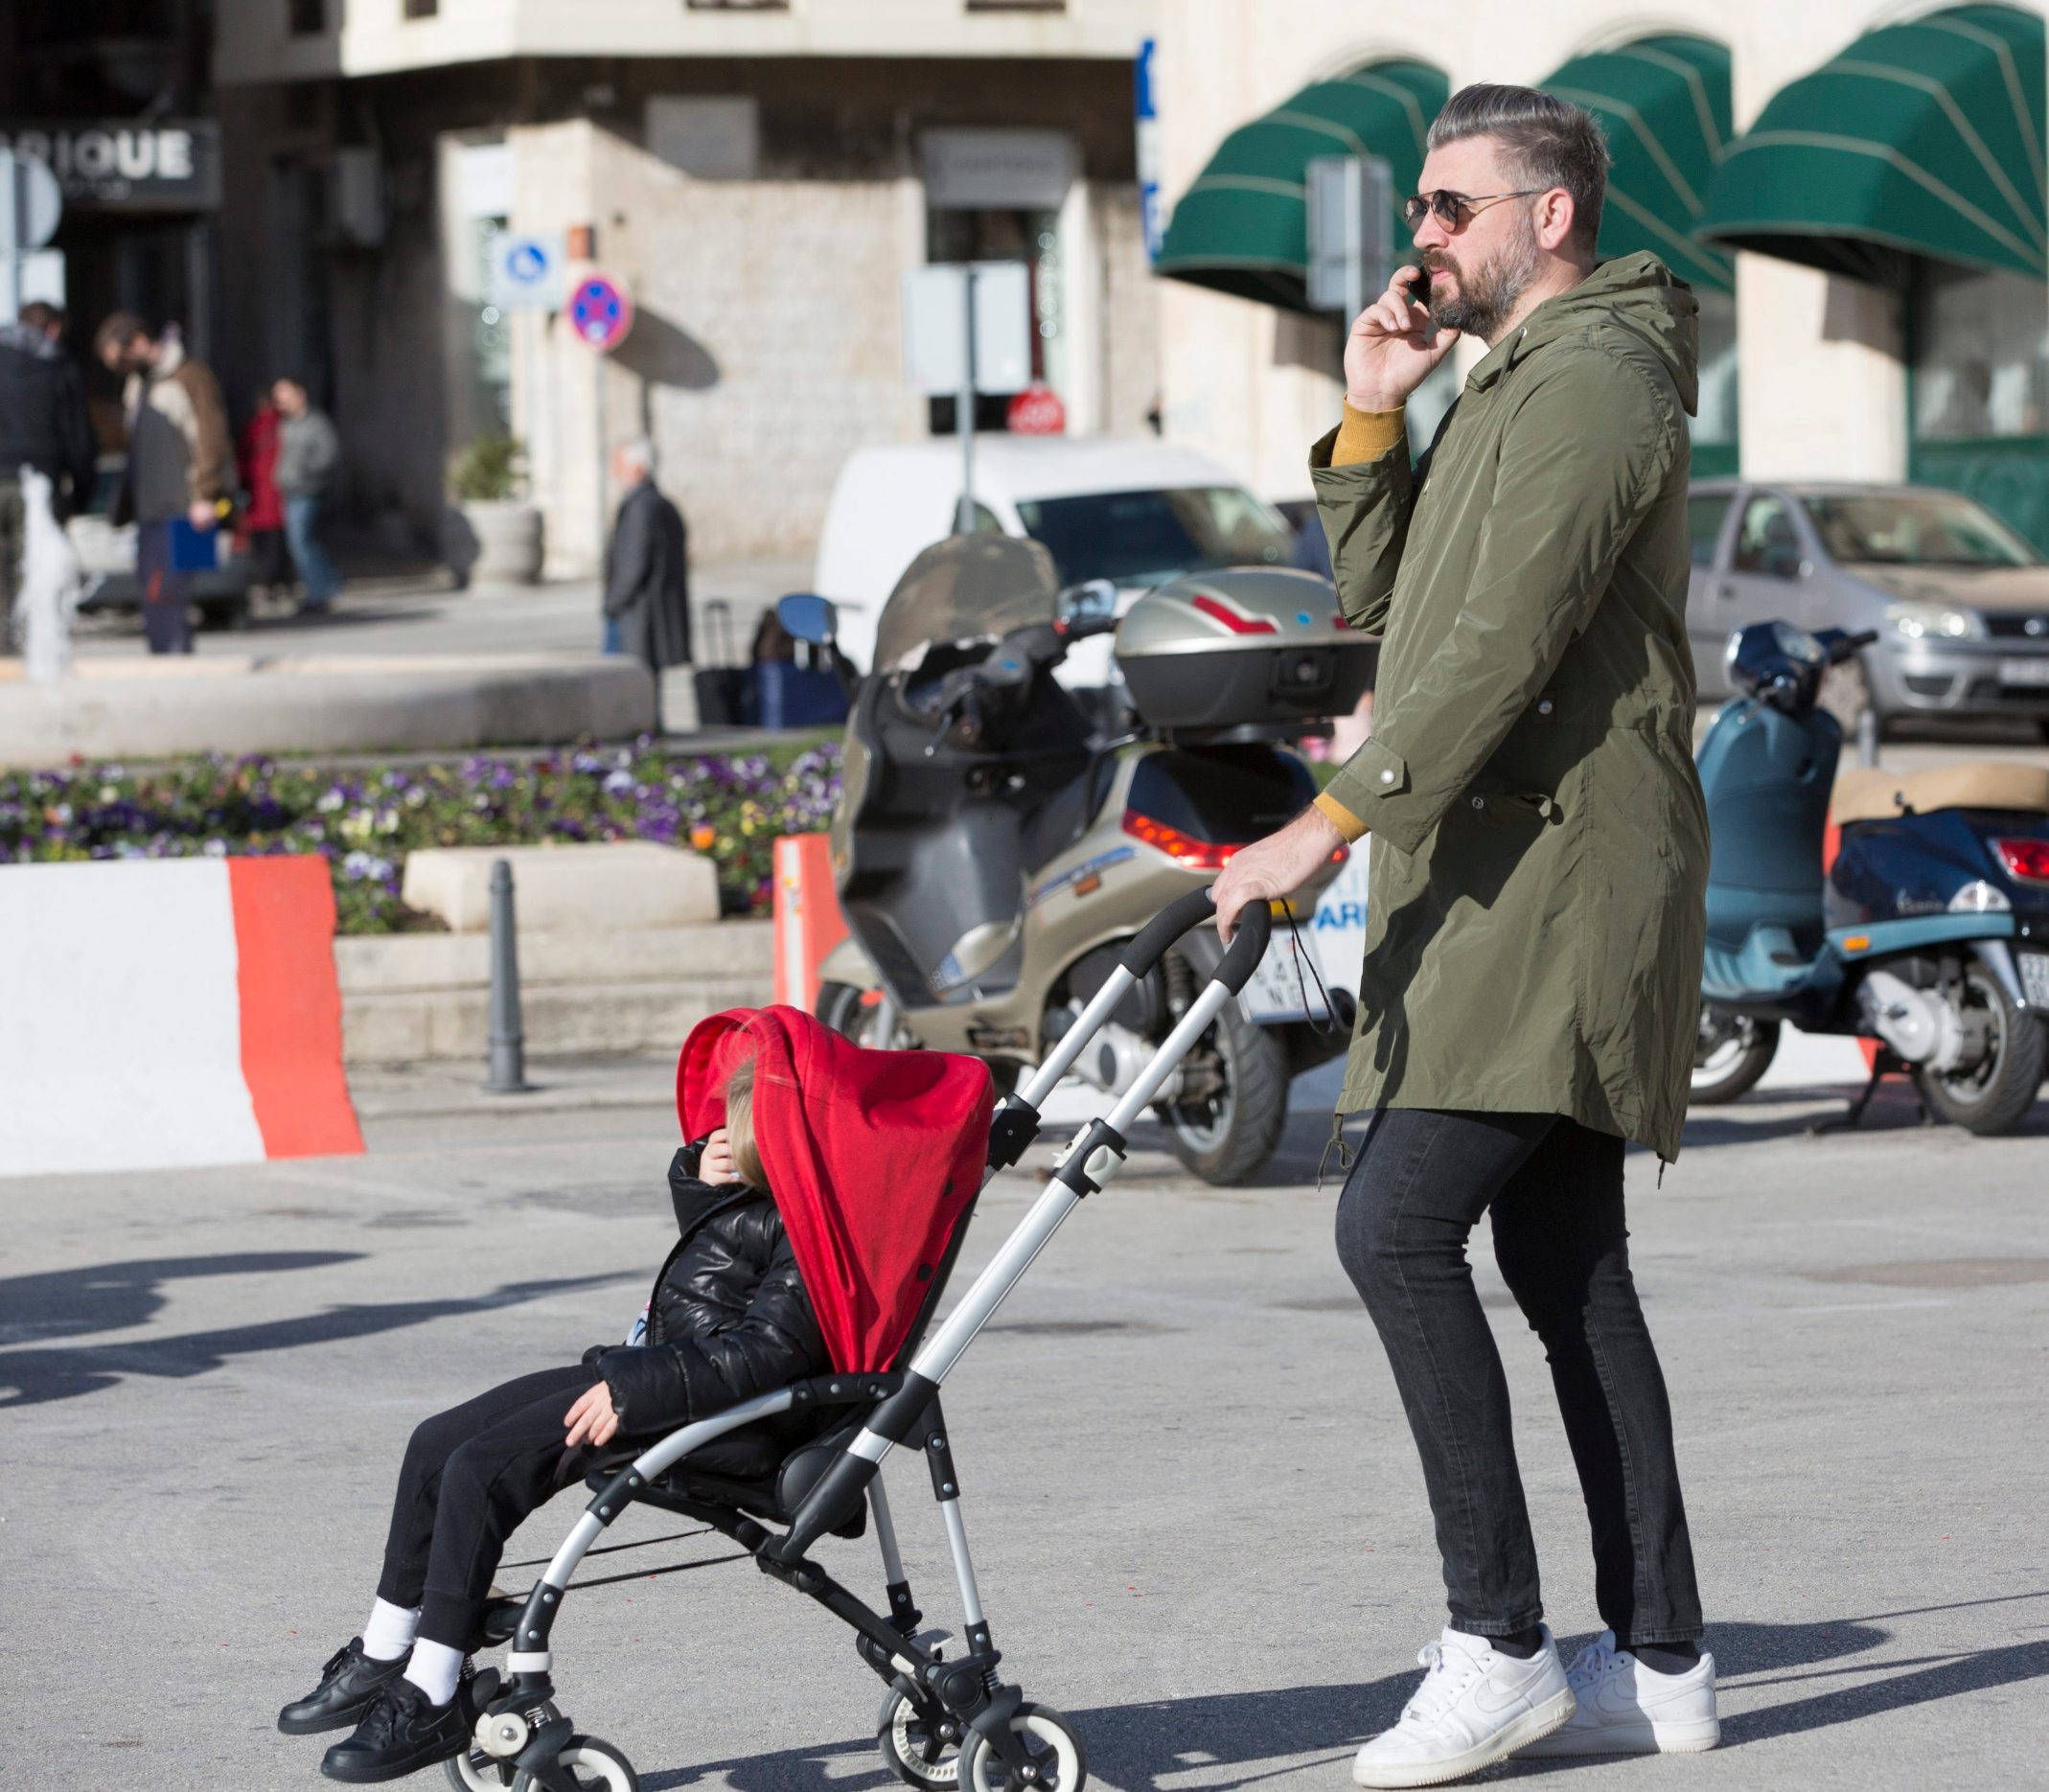 Split, 030118. Stipe Pletikosa bivsi vratar Hajduka i reprezentacije u setnji gradom sa sinom. Foto: Vojko Basic / CROPIX